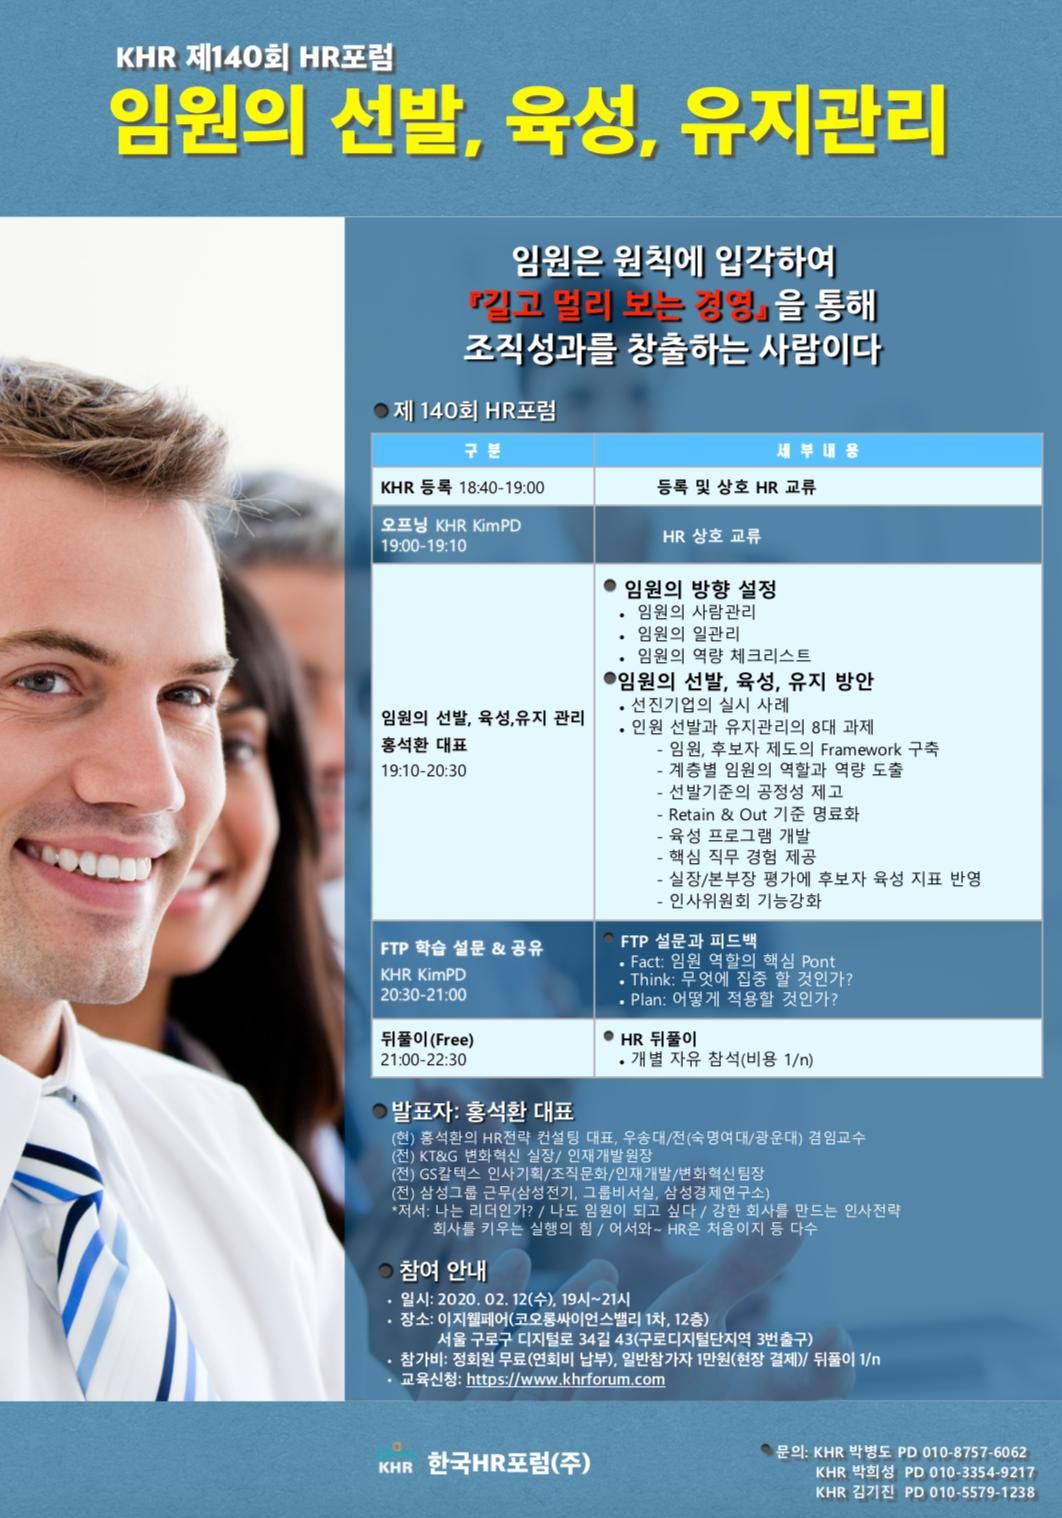 KHR_제140회 임원의 선발, 육성, 유지관리.png